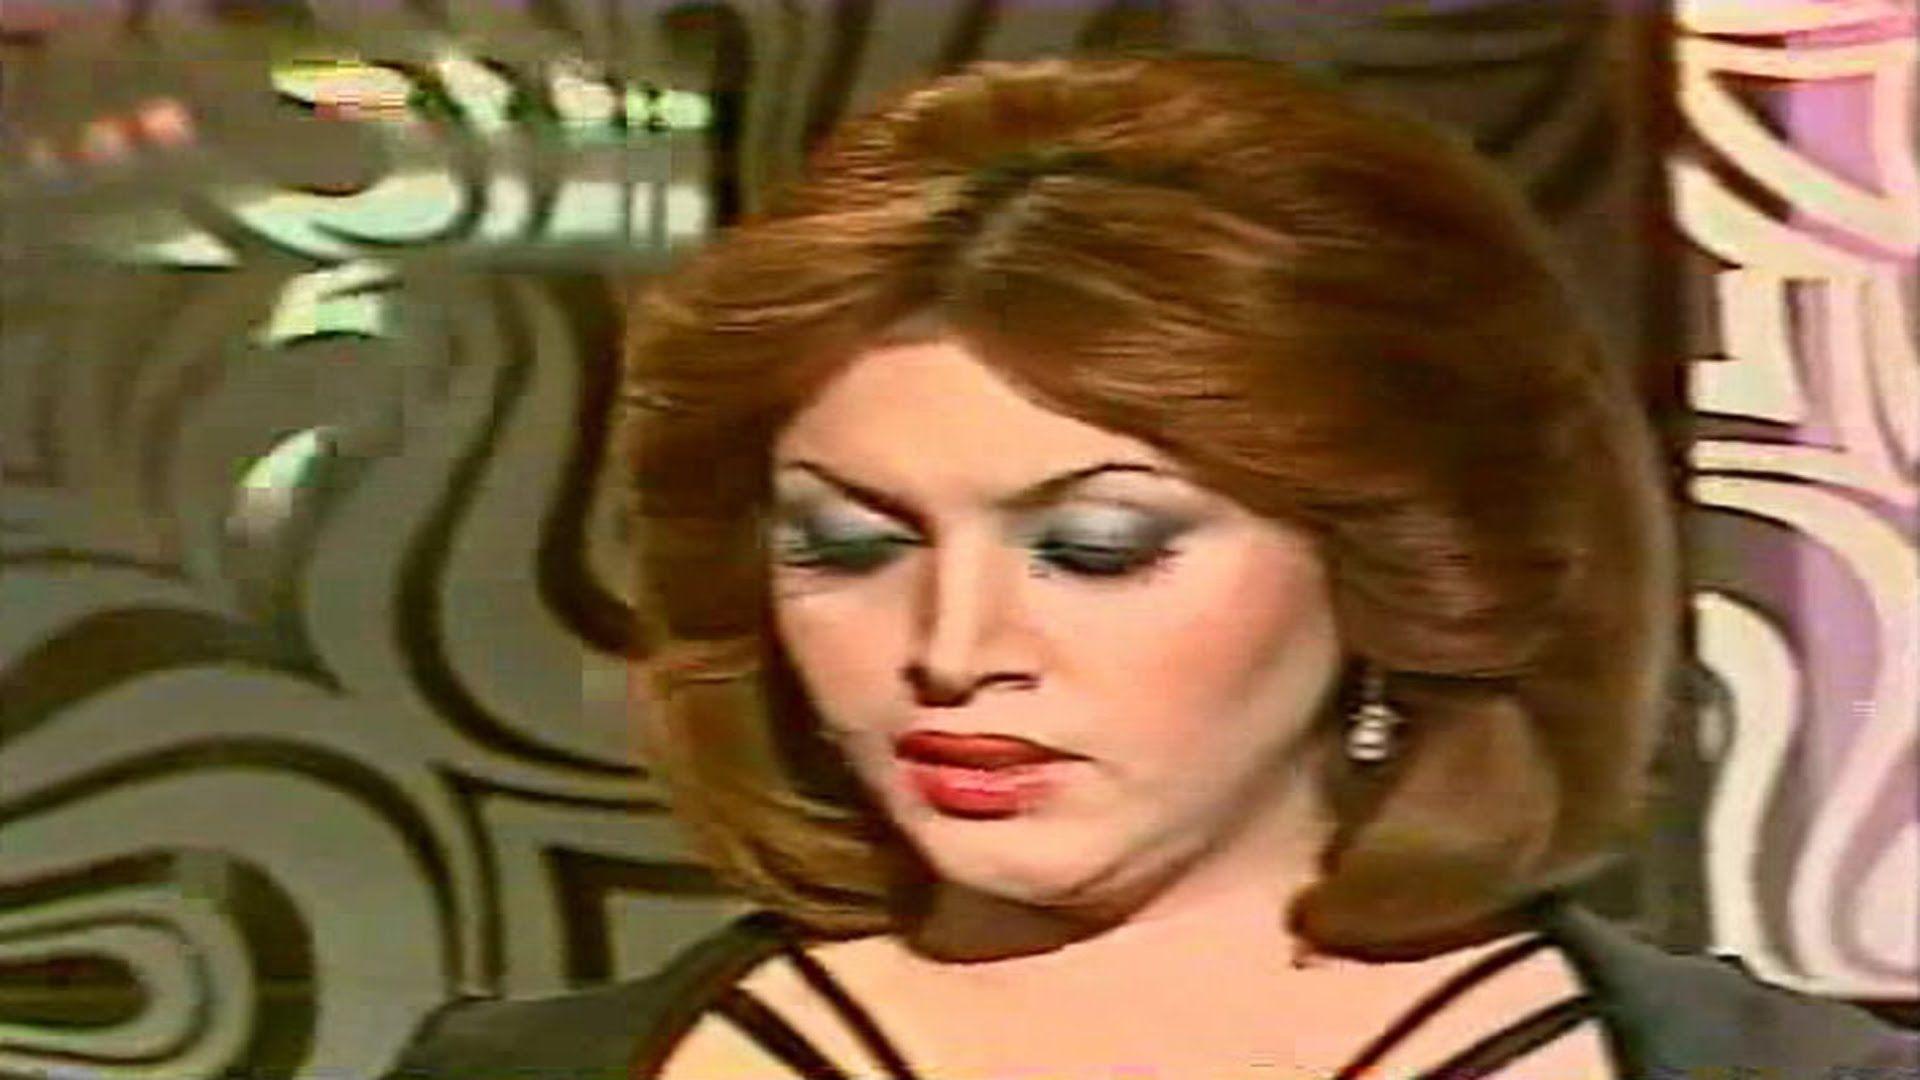 Mahasti Dorangi Hq مهستی دورنگی Iranian Actors Dance Workout Celebrities